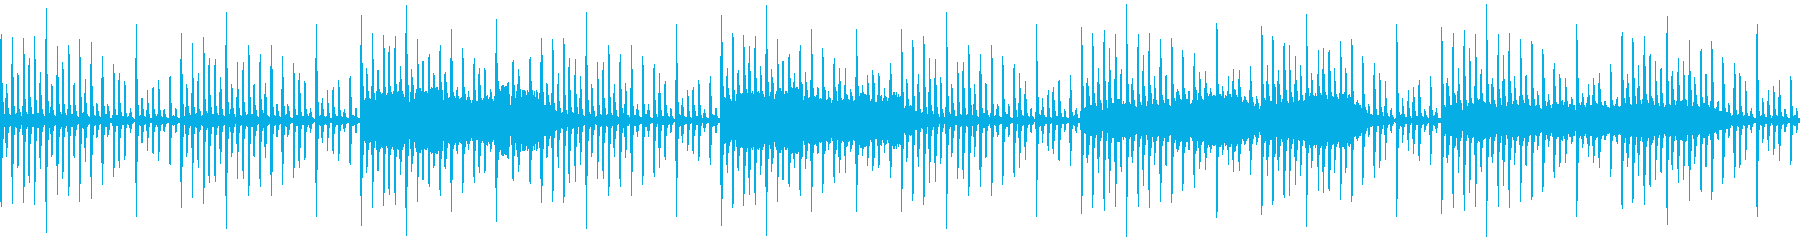 8bitで浮遊感あるBGMの再生済みの波形